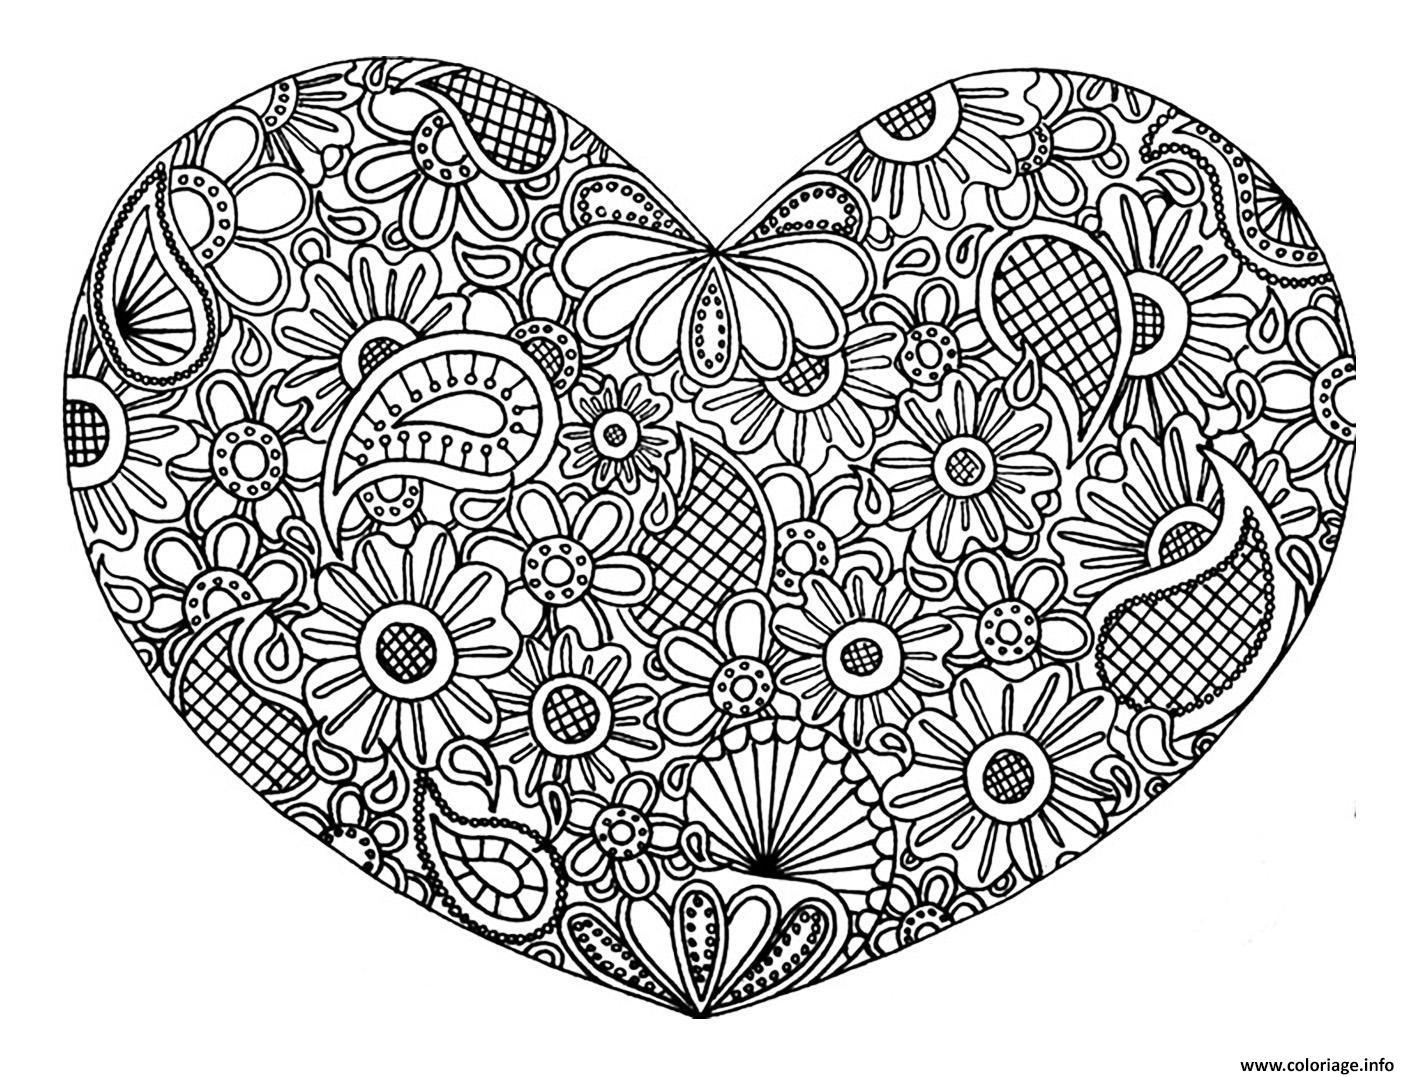 Coloriage adulte coeur mandala fleurs zen stvalentin - Mandala coeur imprimer gratuitement ...